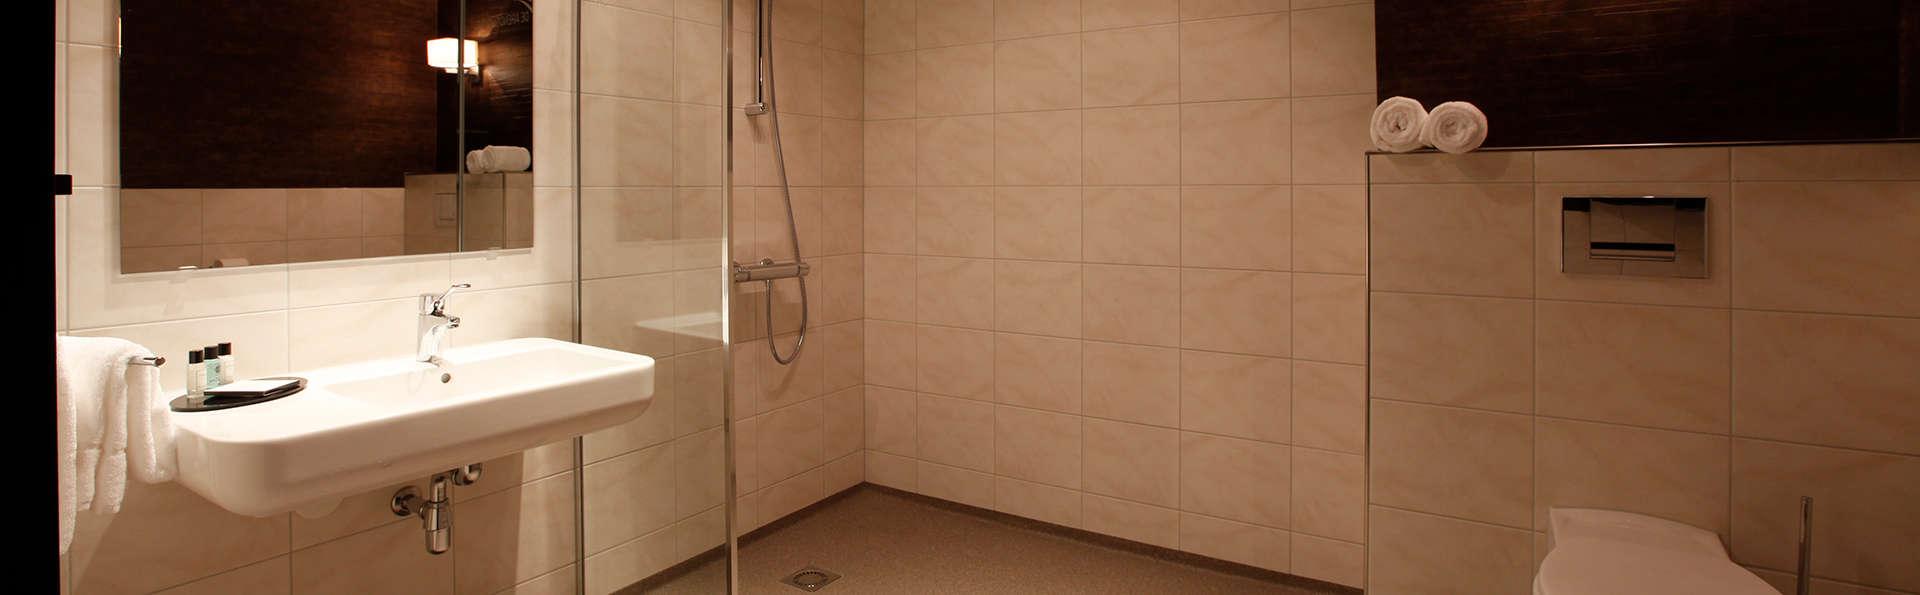 De Arendshoeve - Hotel & Restaurant - Edit_Bathroom2.jpg